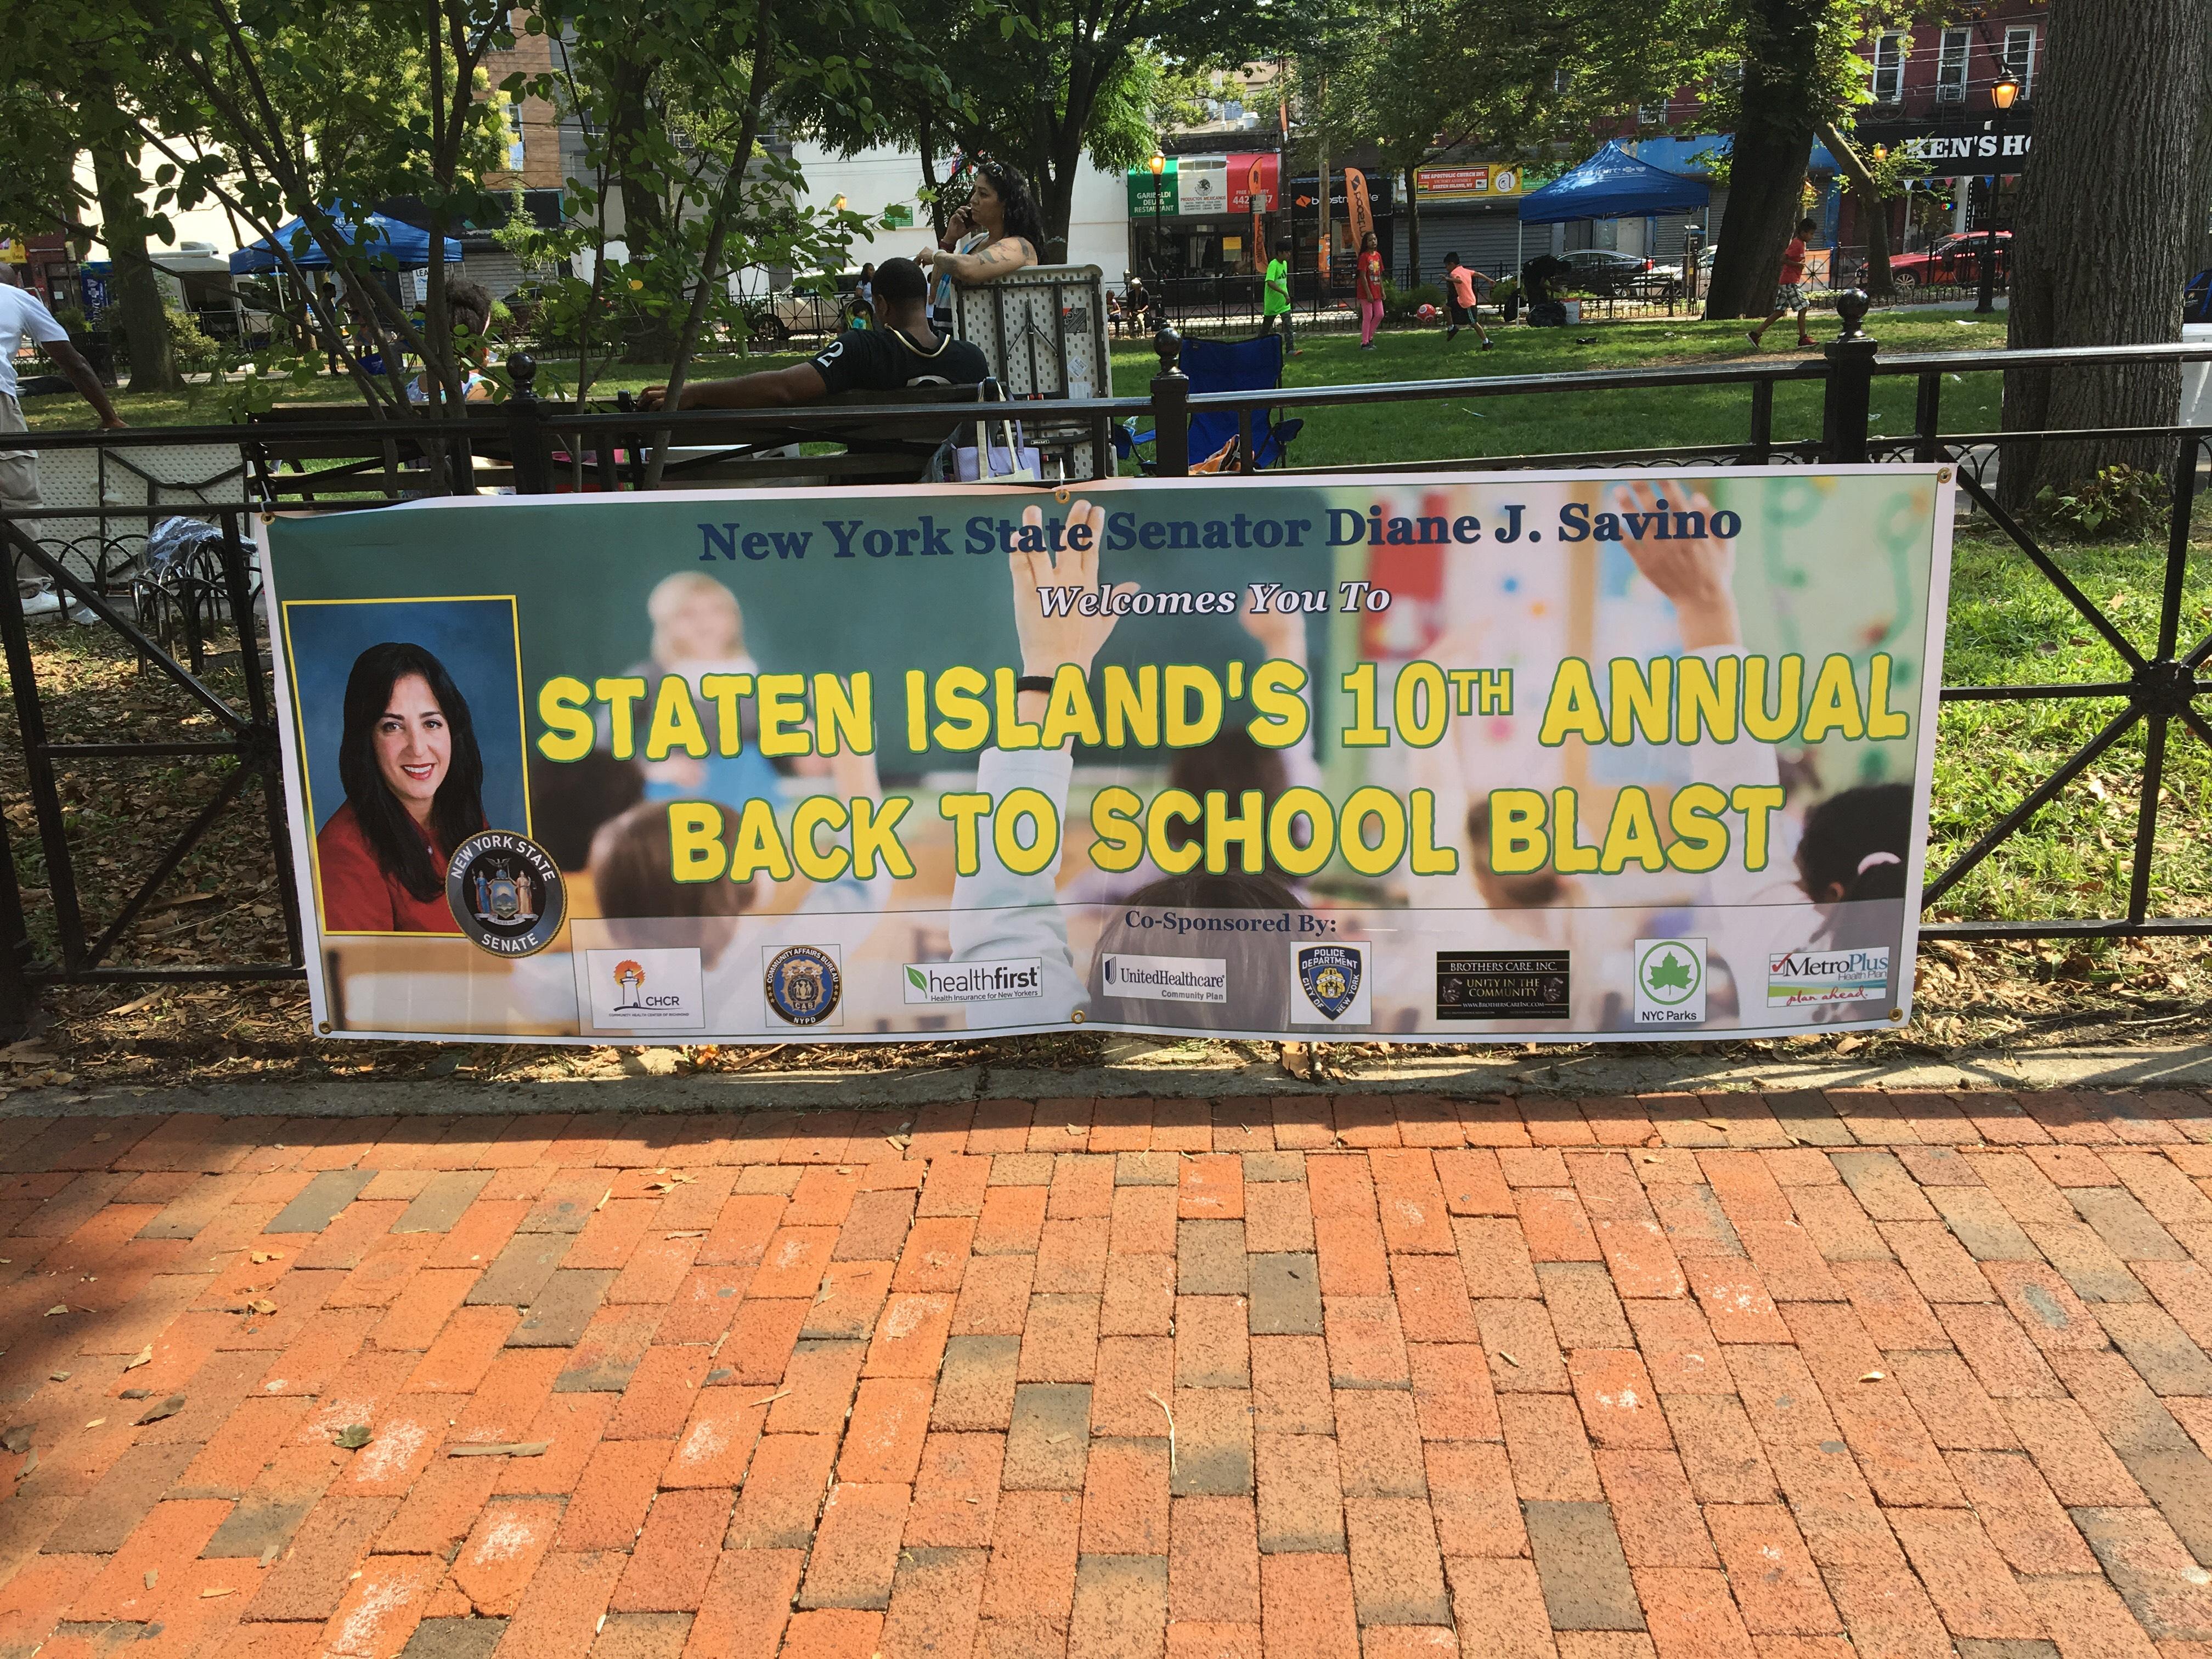 Helping Senator Diane Savino Give Out Free School Supplies in Staten Island